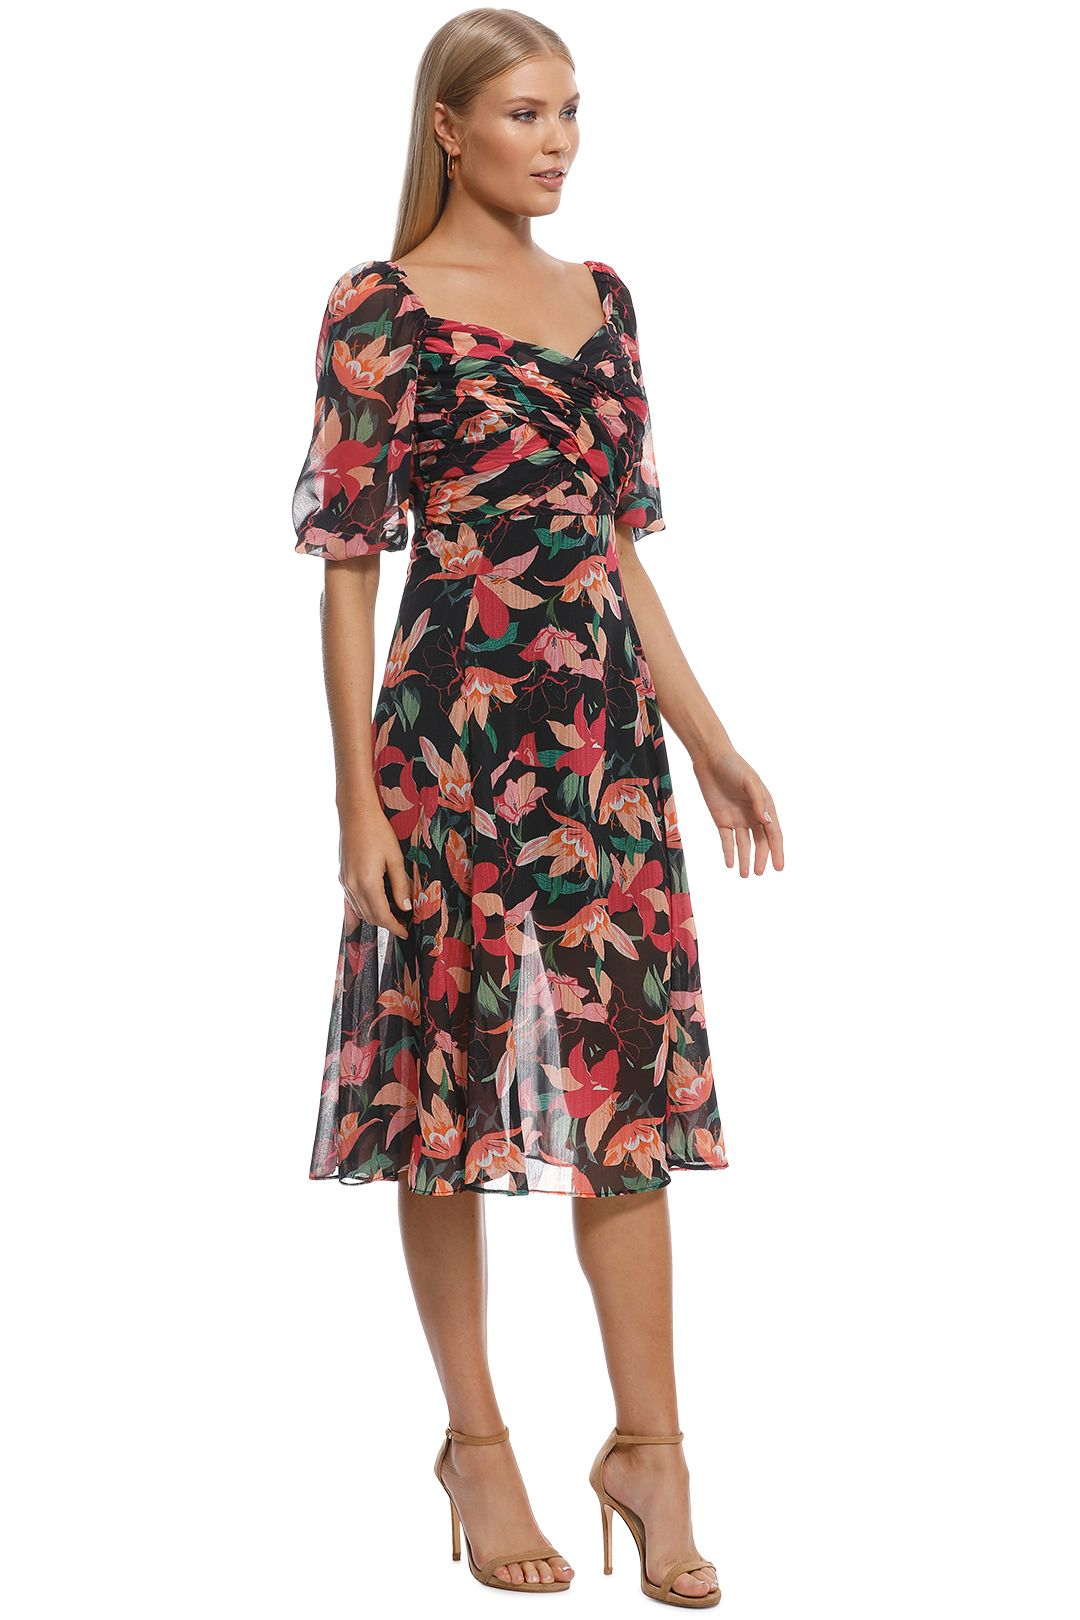 Talulah - Night Mirage Midi Dress - Black Floral - Side